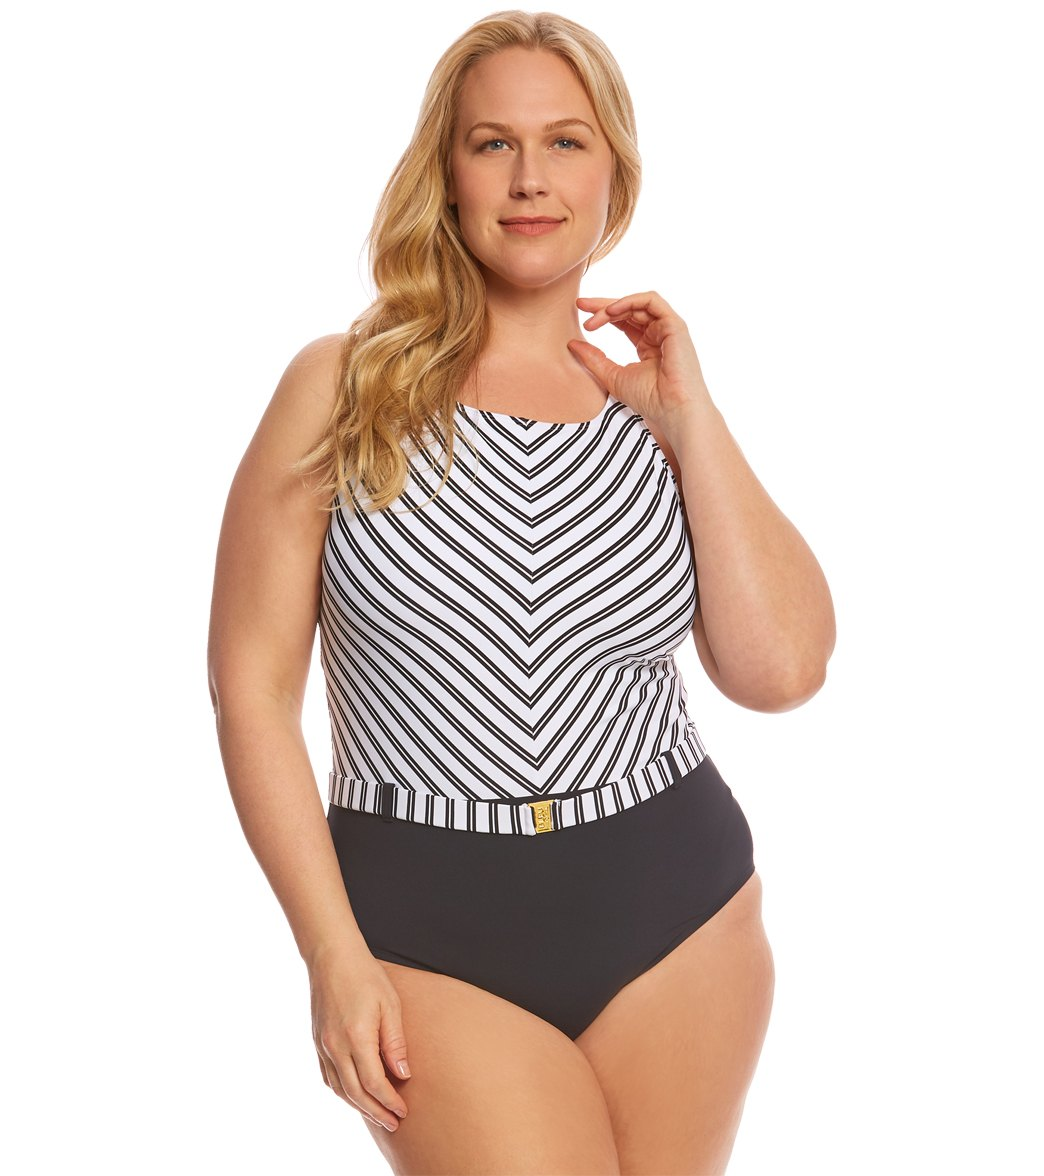 ccc4465410 ... Low Waist Plus Size One Piece Swimsuit